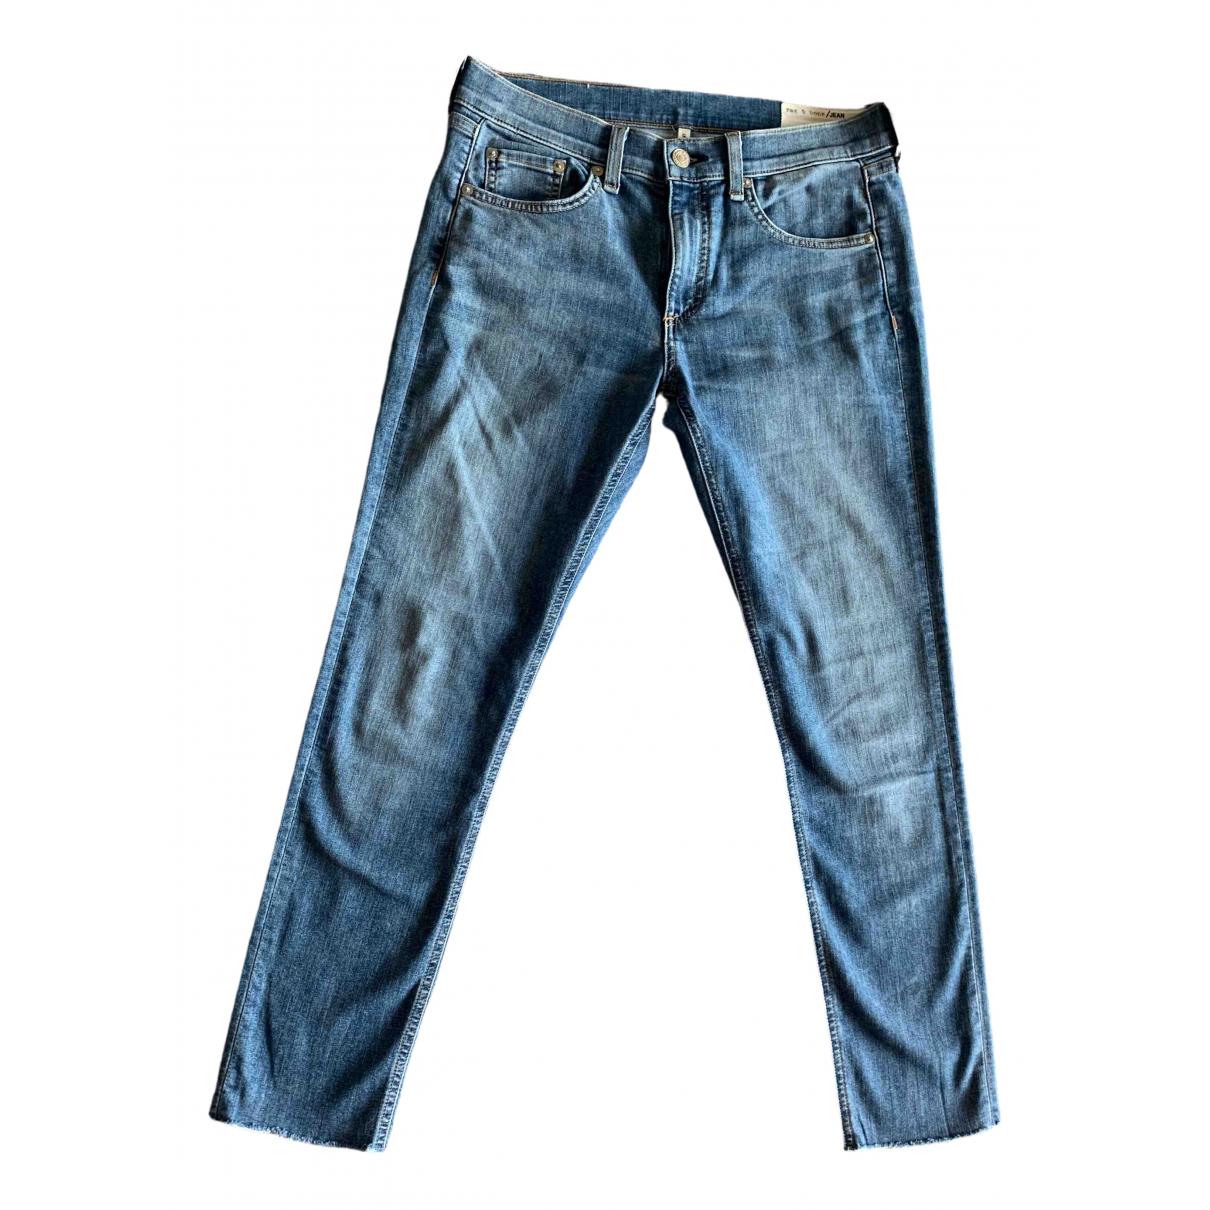 Rag & Bone \N Blue Denim - Jeans Jeans for Women 27 US